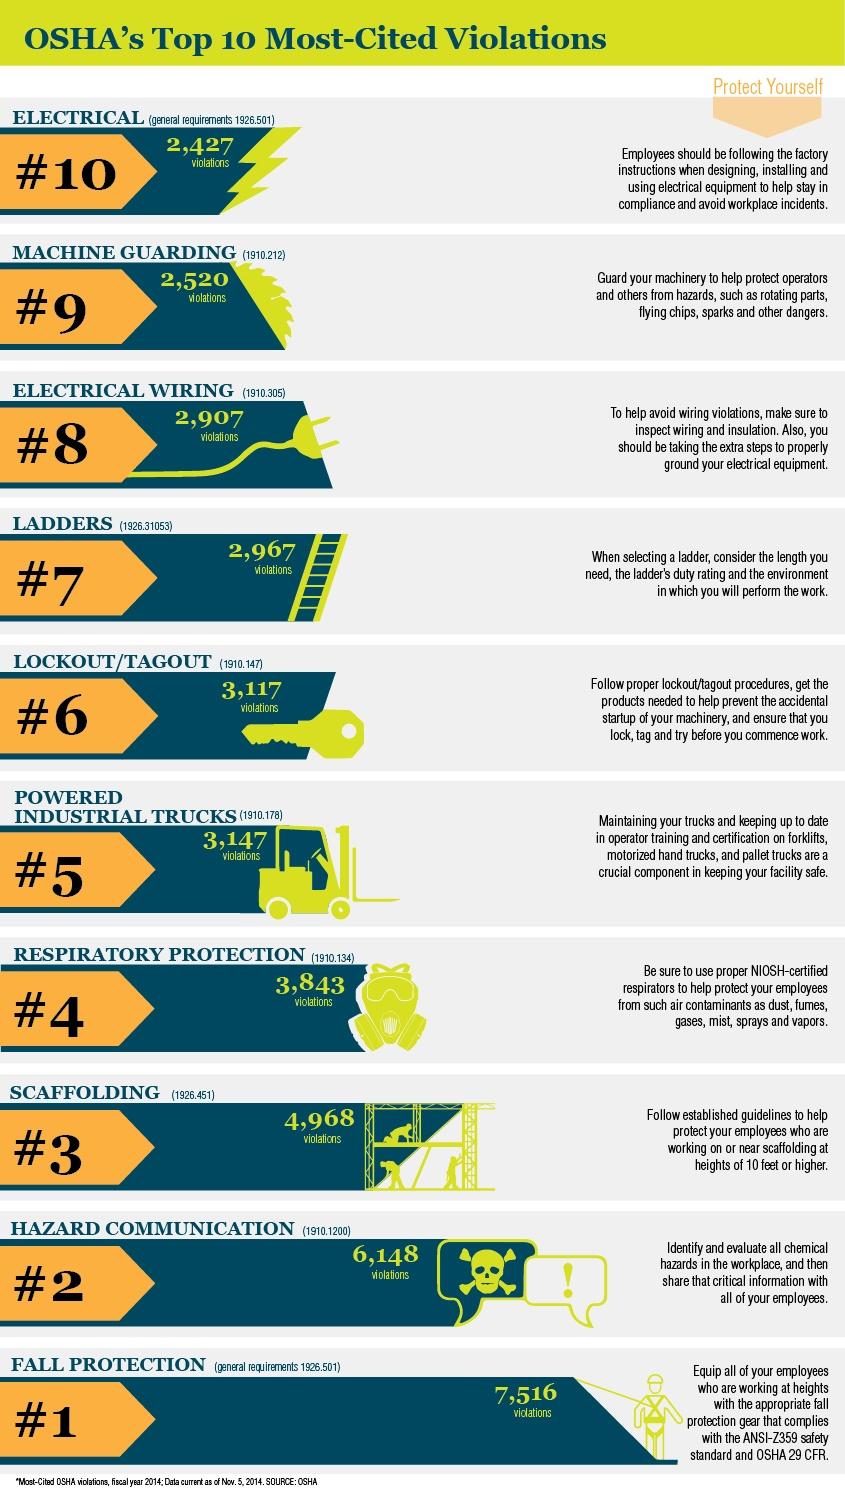 osha u0026 39 s fines list  top 10 violations cited